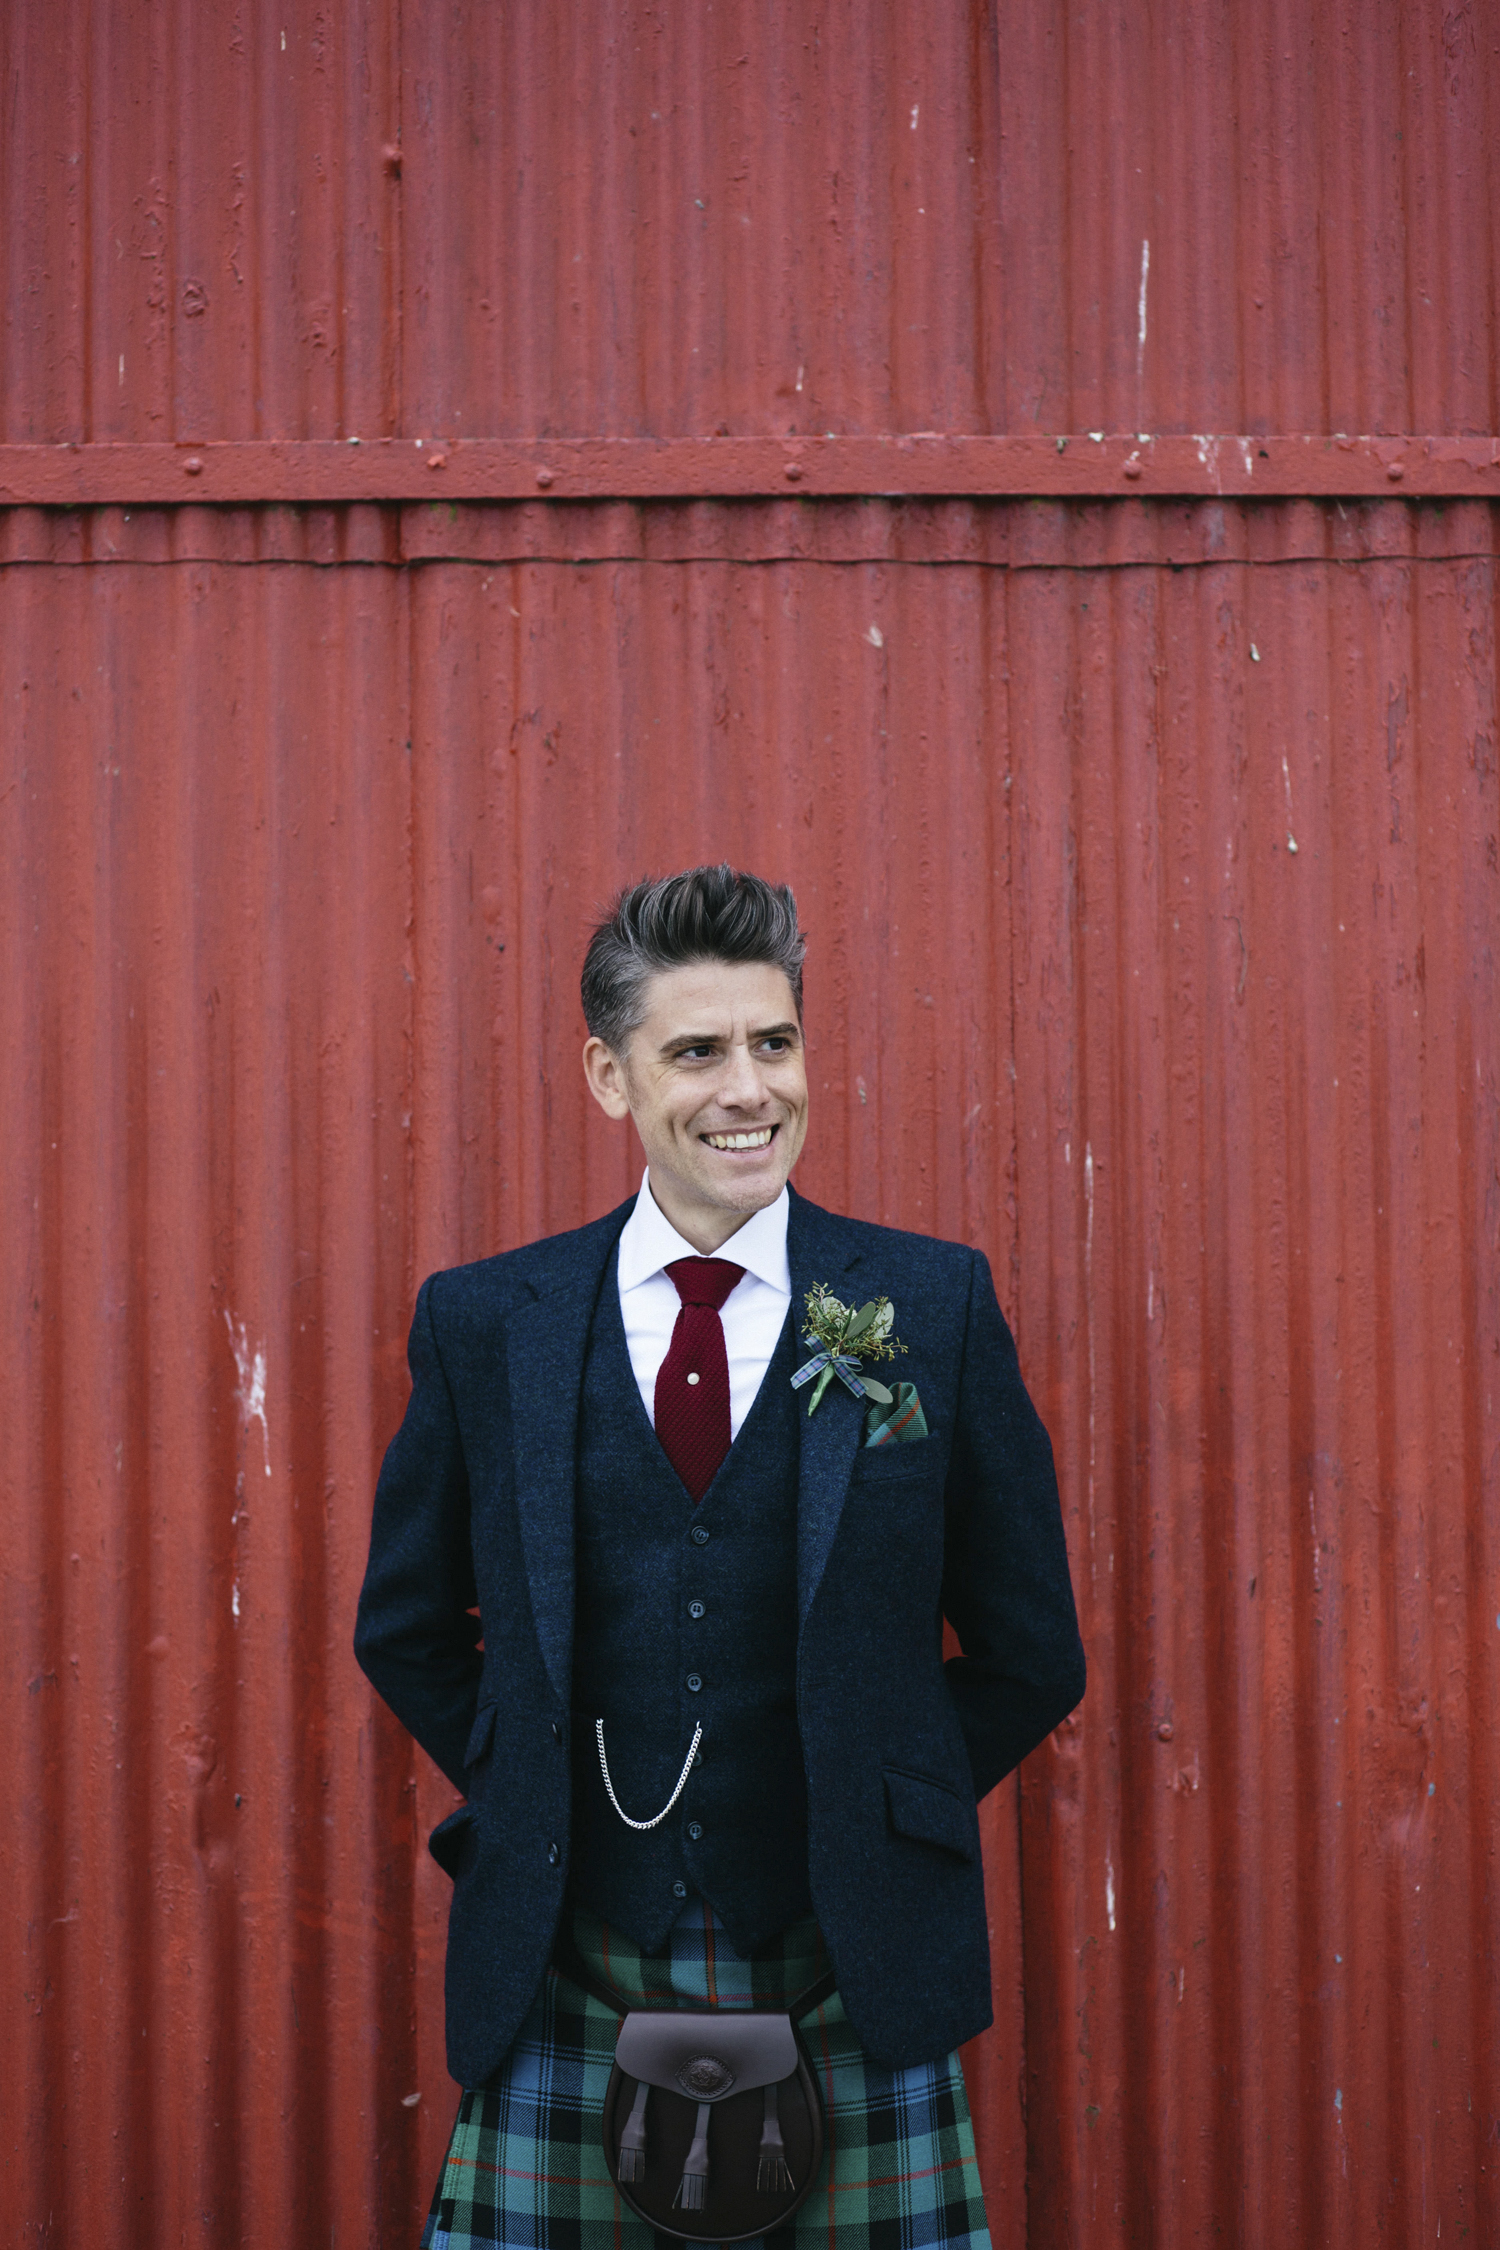 Alternative_wedding_photographer_scotland_fife_standrews_kinkell-24.jpg